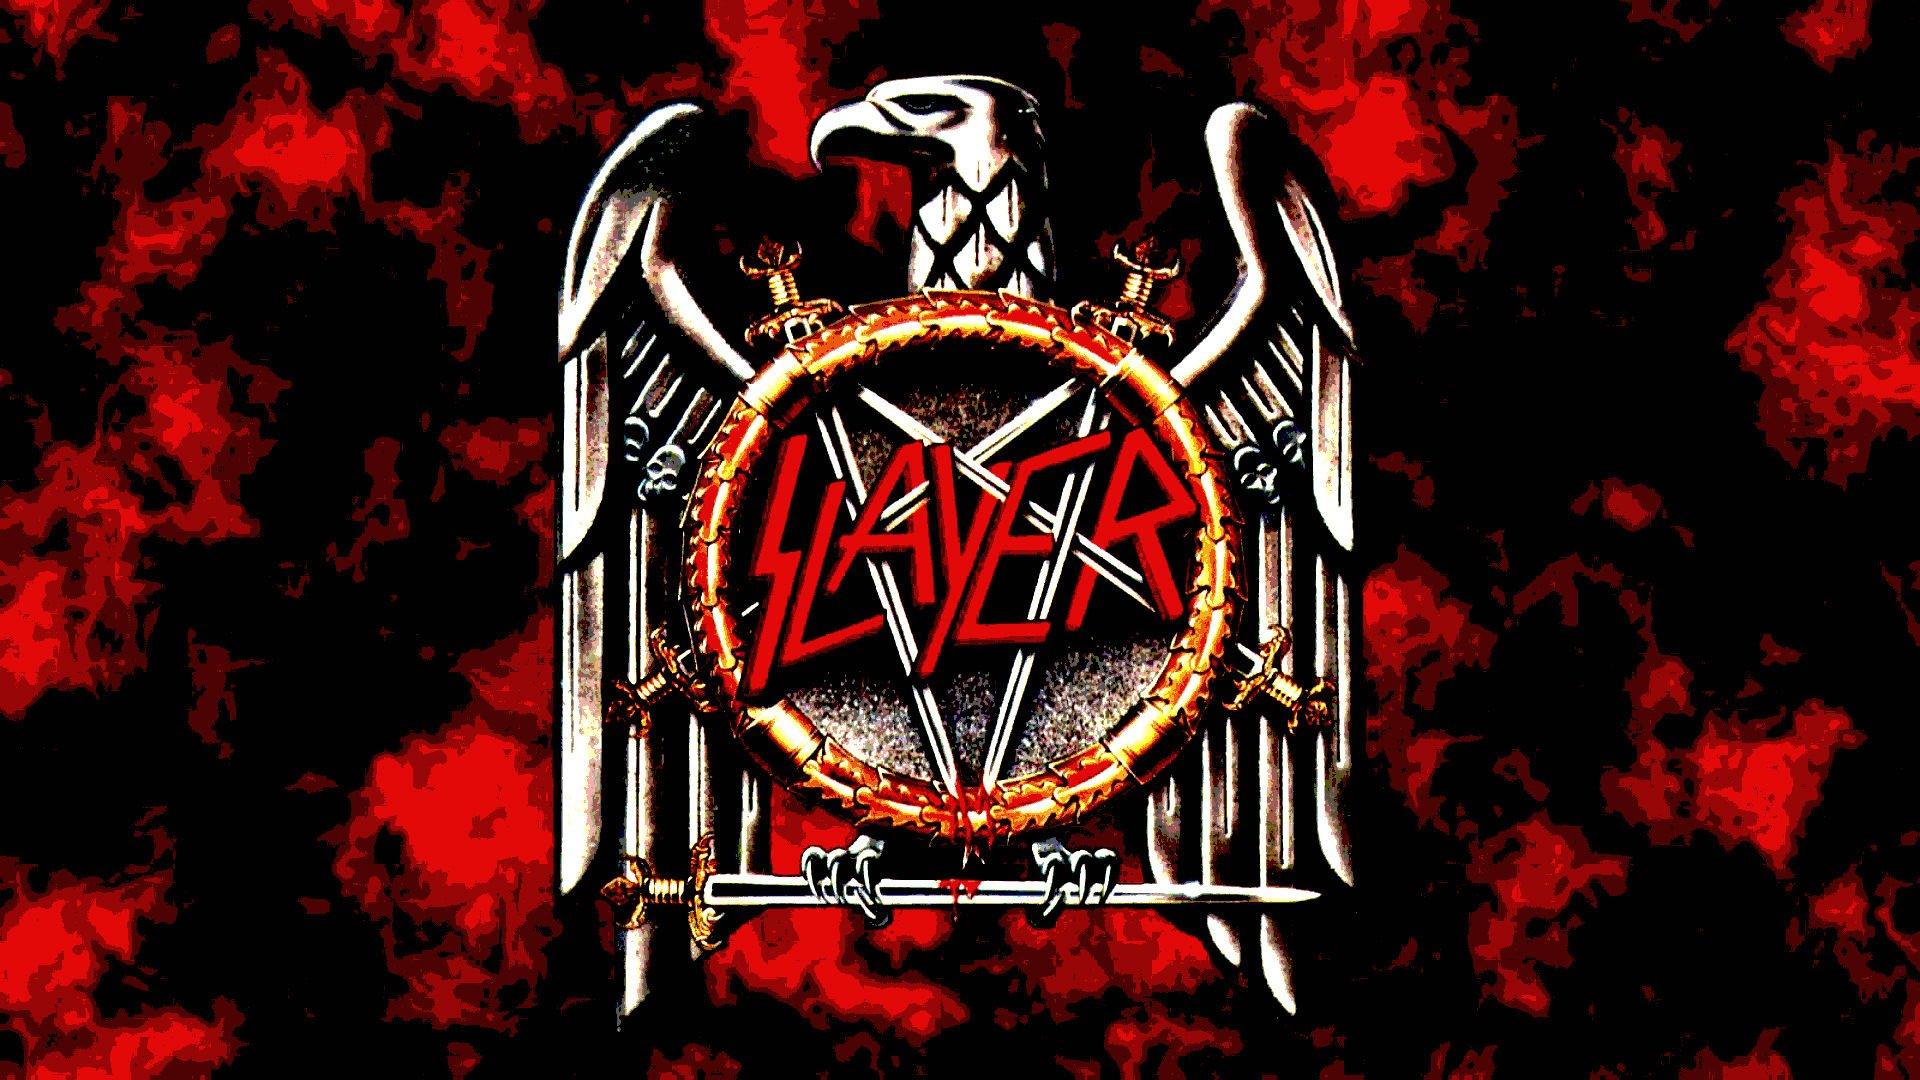 Slayer death metal heavy thrash dark wallpaper 1920x1080 - Death metal wallpaper ...